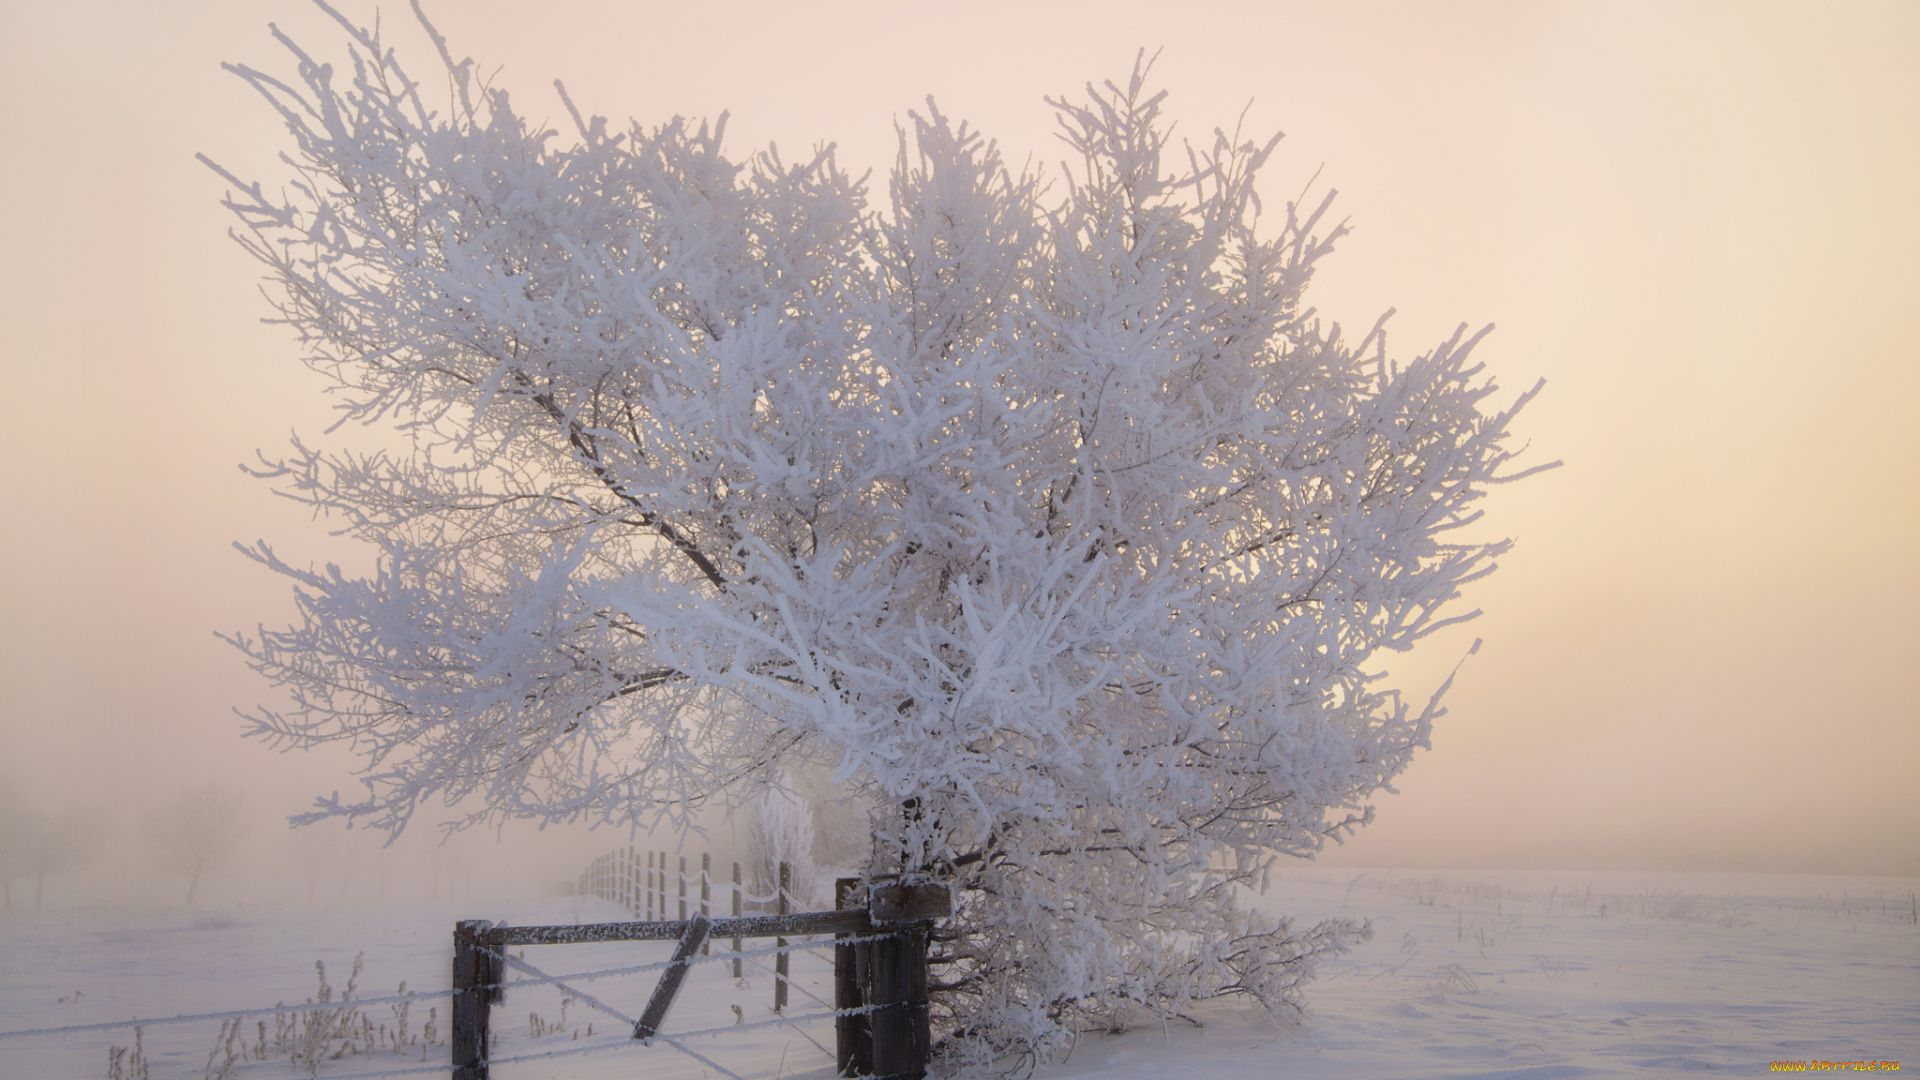 Frosty Winter Morning Photo